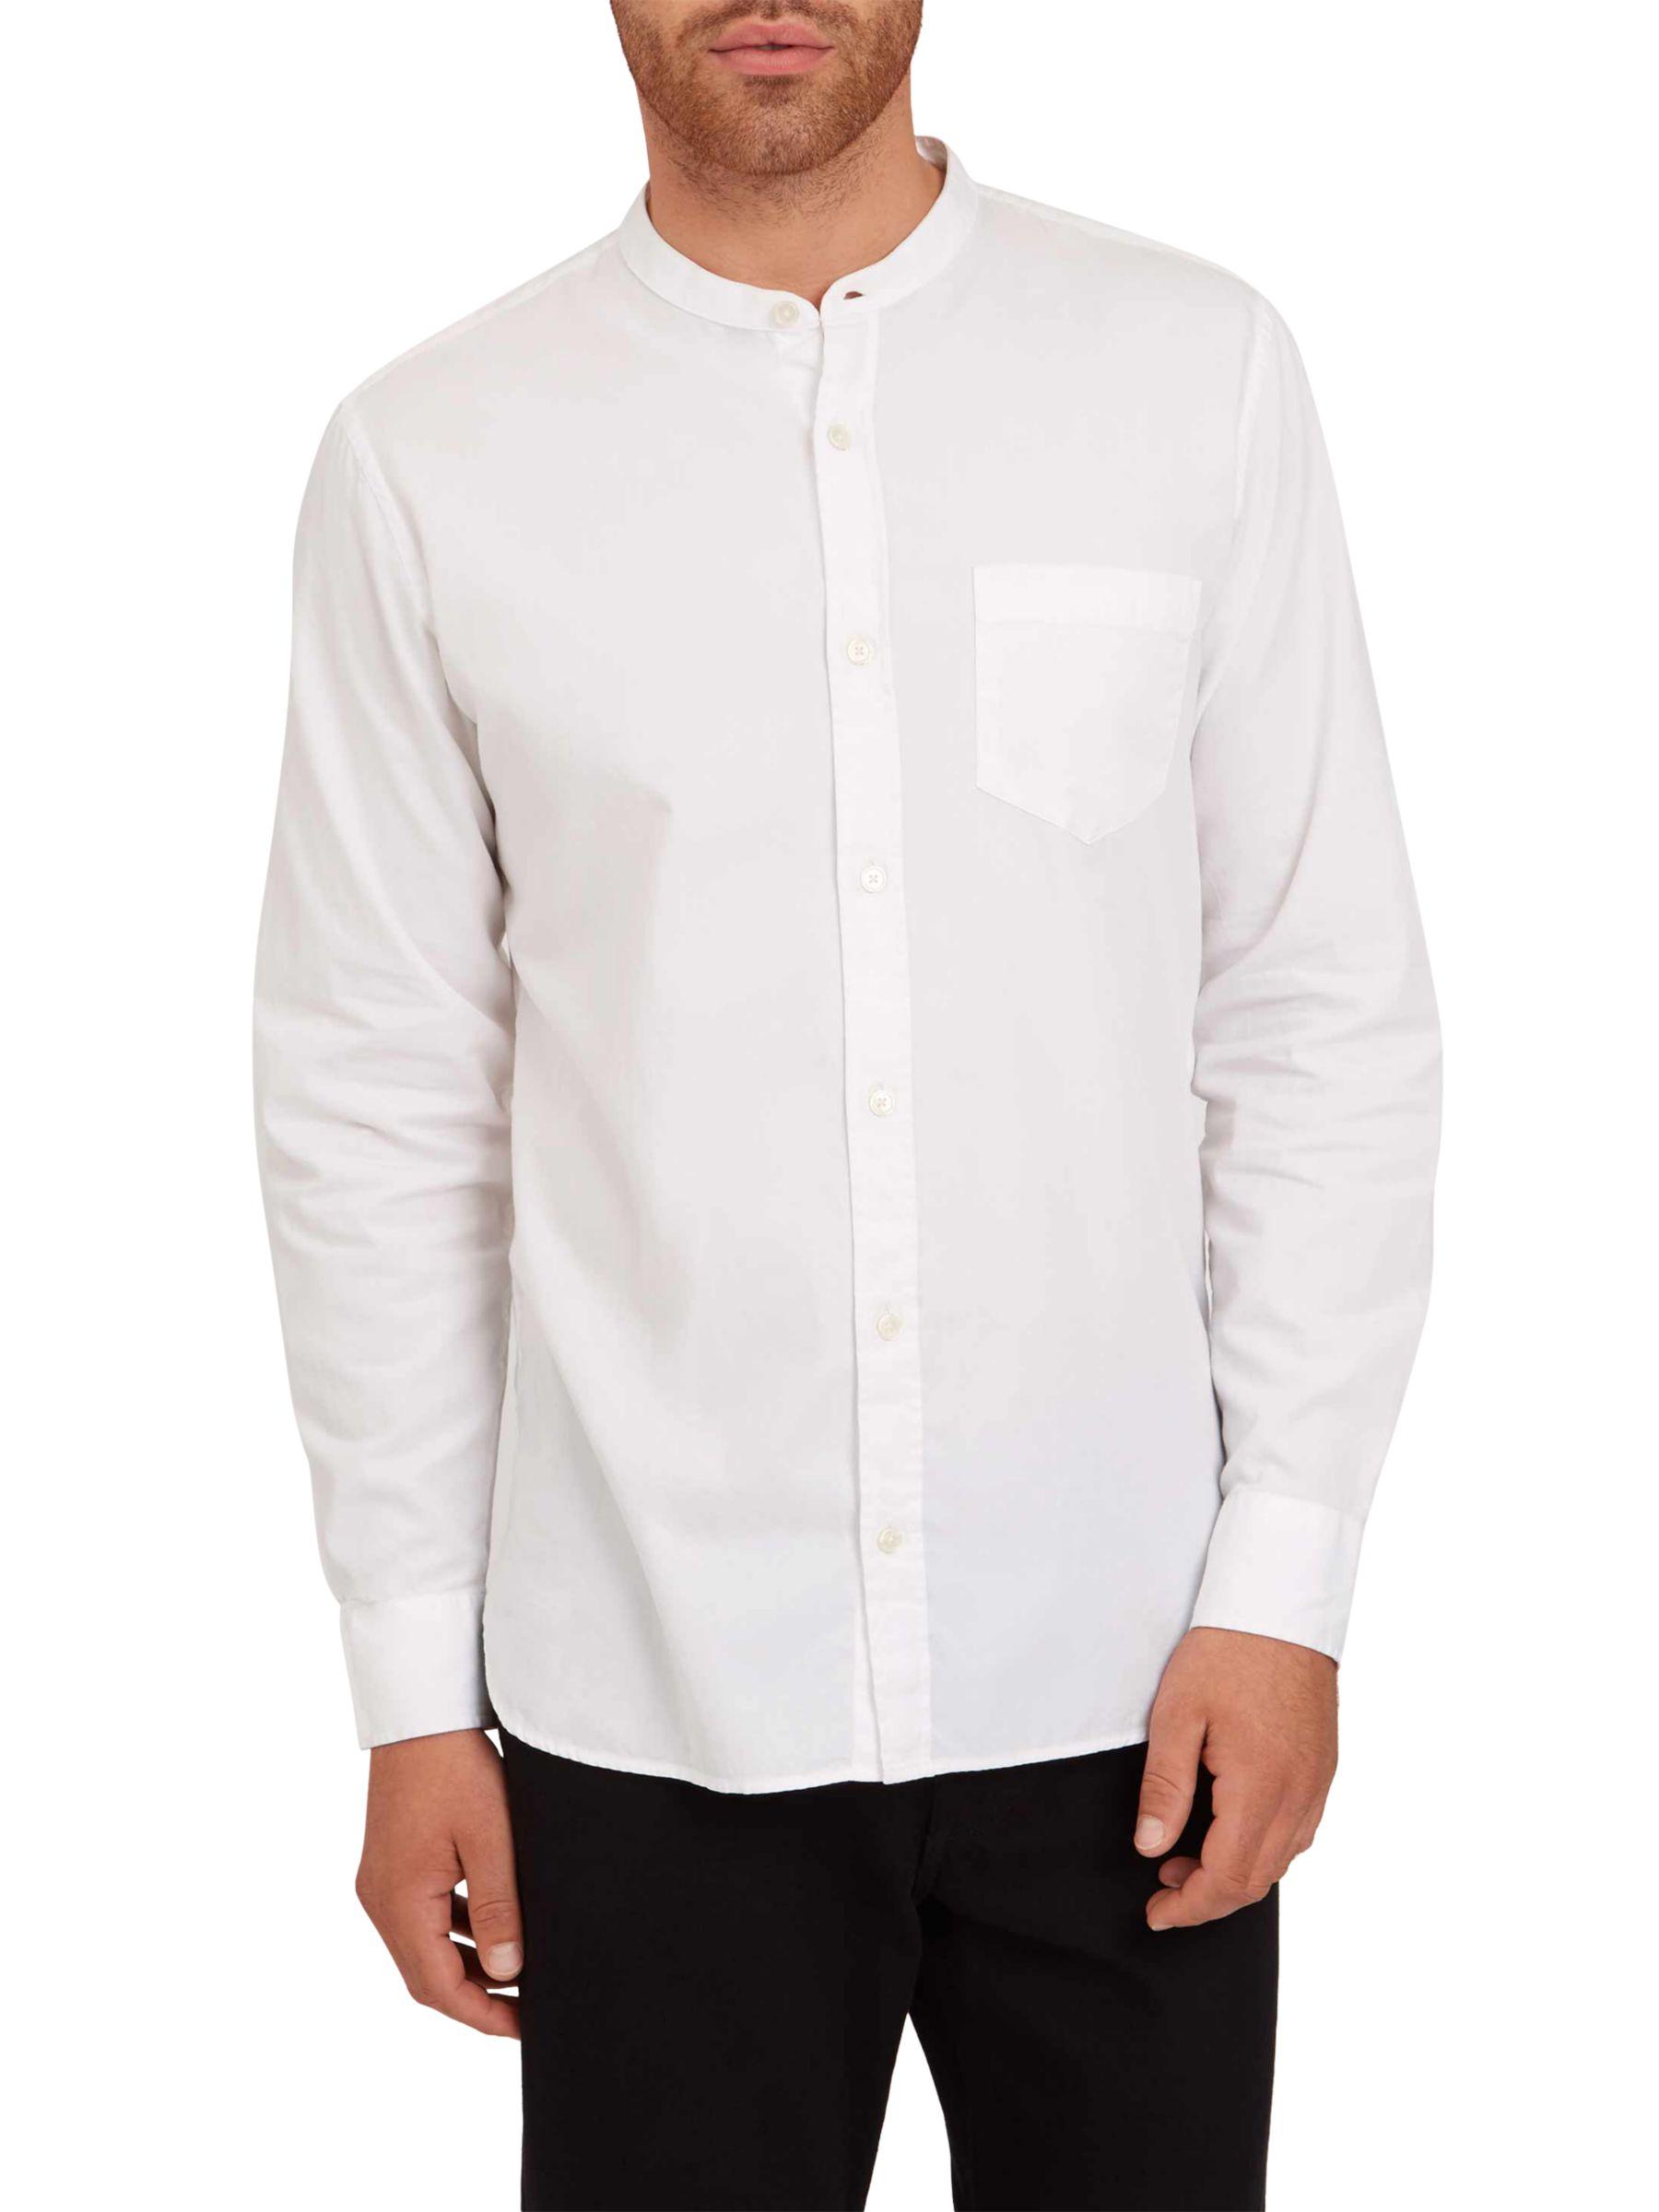 Collarless Dress Shirts Uk Bcd Tofu House